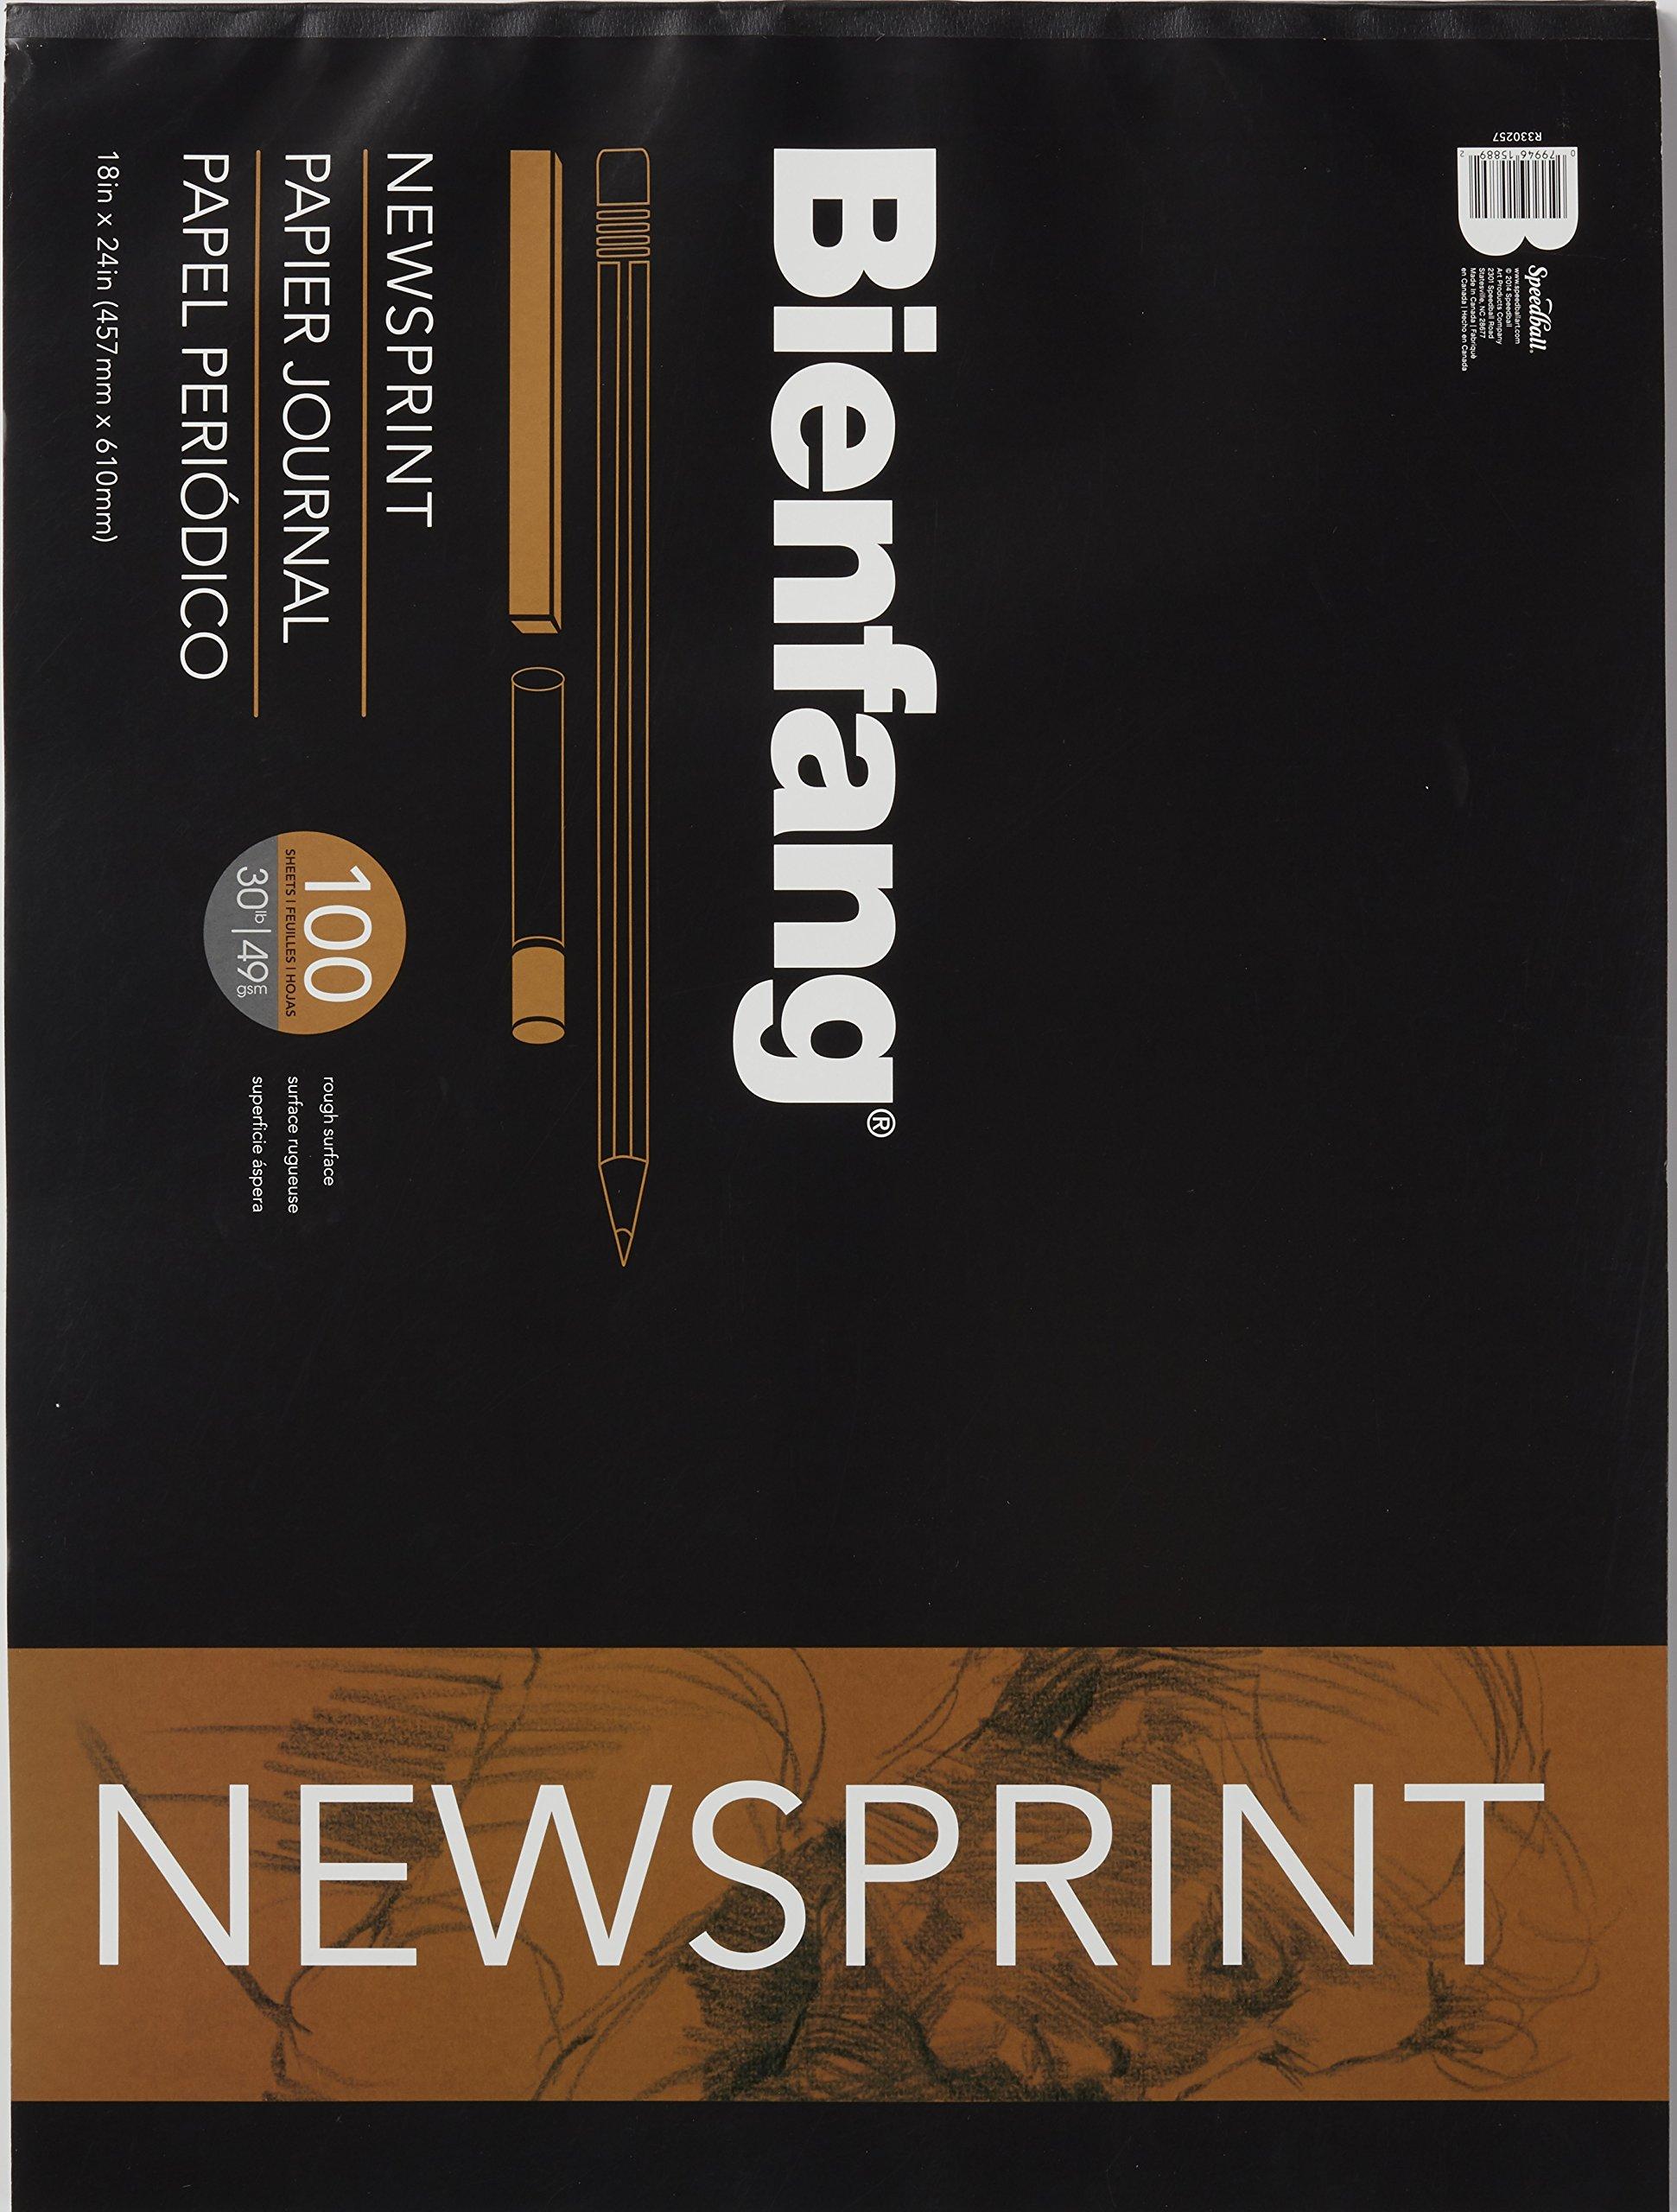 Bienfang 18 by 24-Inch Newsprint Paper Pad, 100 Sheets (R330257) by Bienfang